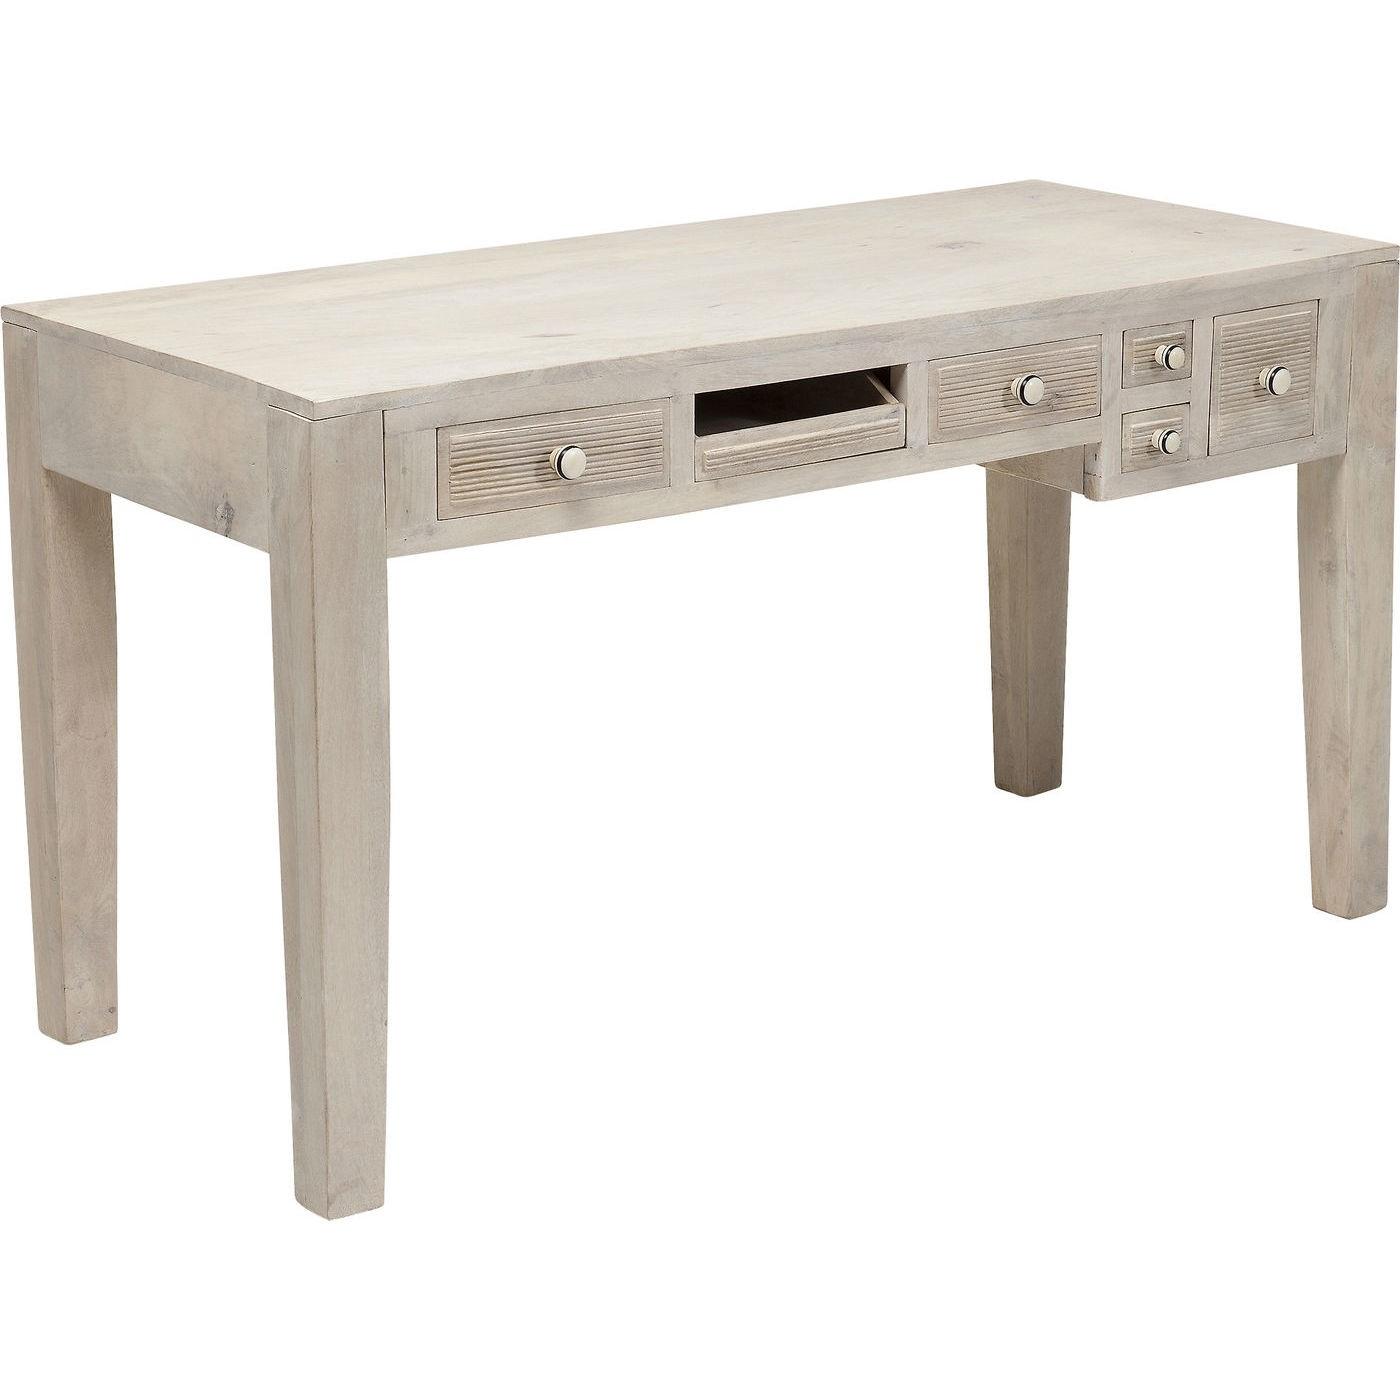 Bureau en bois Linear 6 tiroirs 135x60cm Kare Design